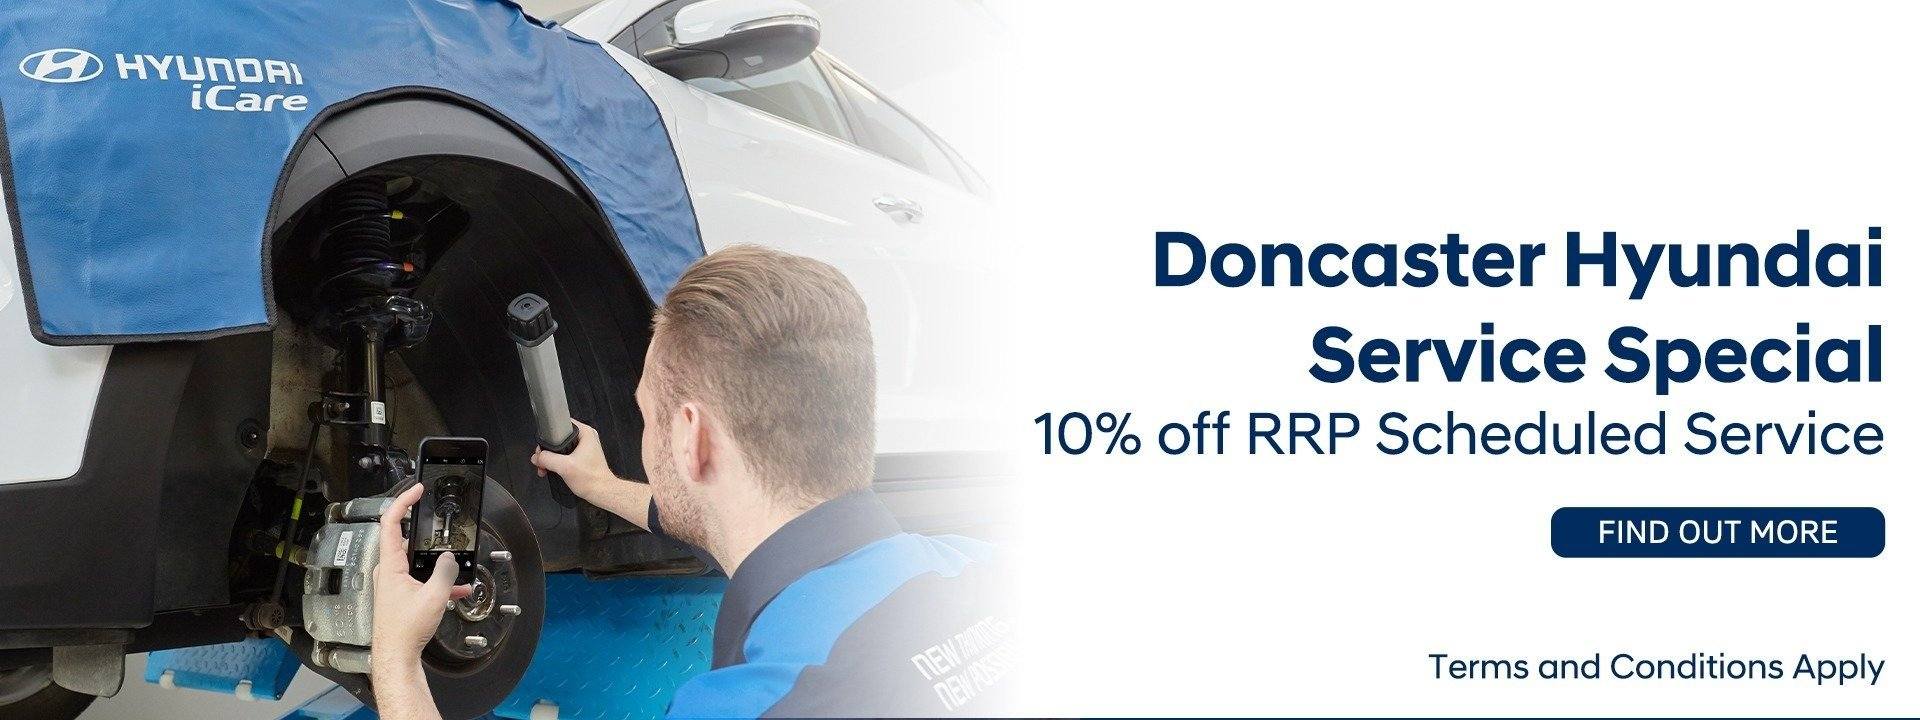 Doncaster Hyundai Service Special